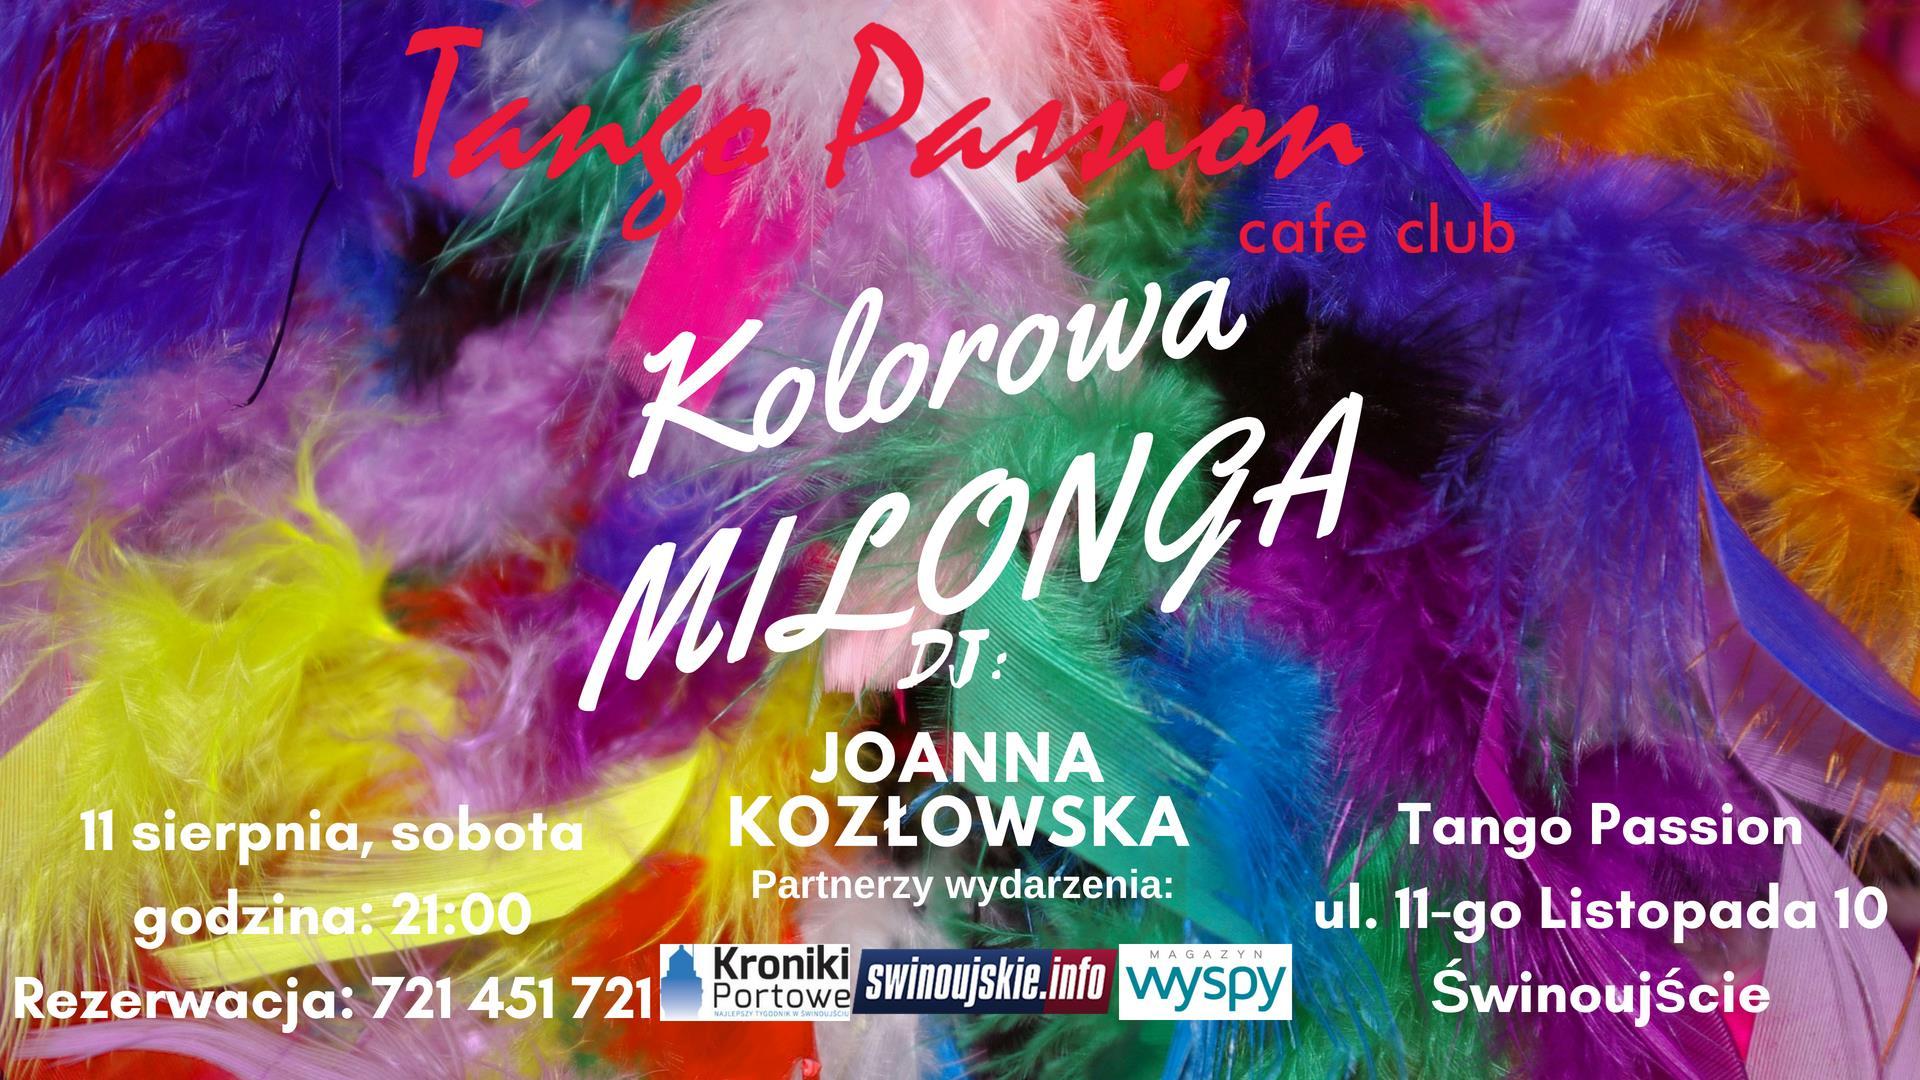 Tango Passion Milonga Kolorowa